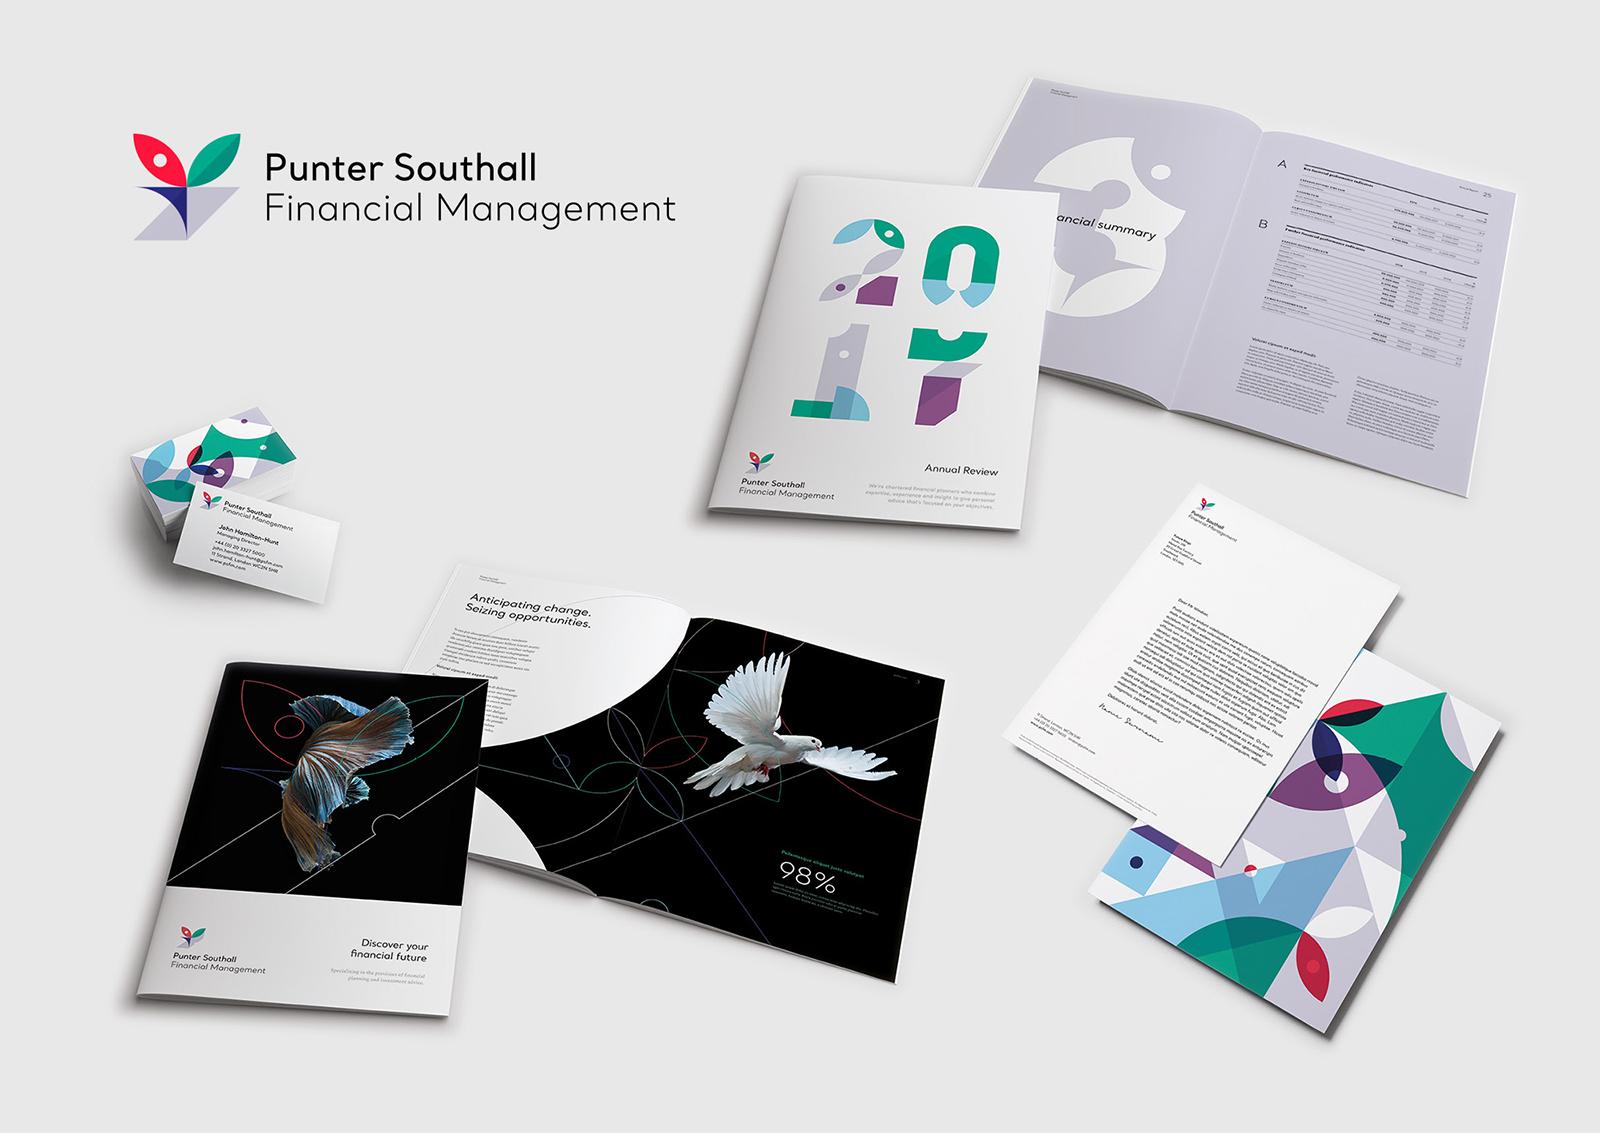 Punter Southall Group集团品牌VI视觉形象设计欣赏-深圳VI设计7